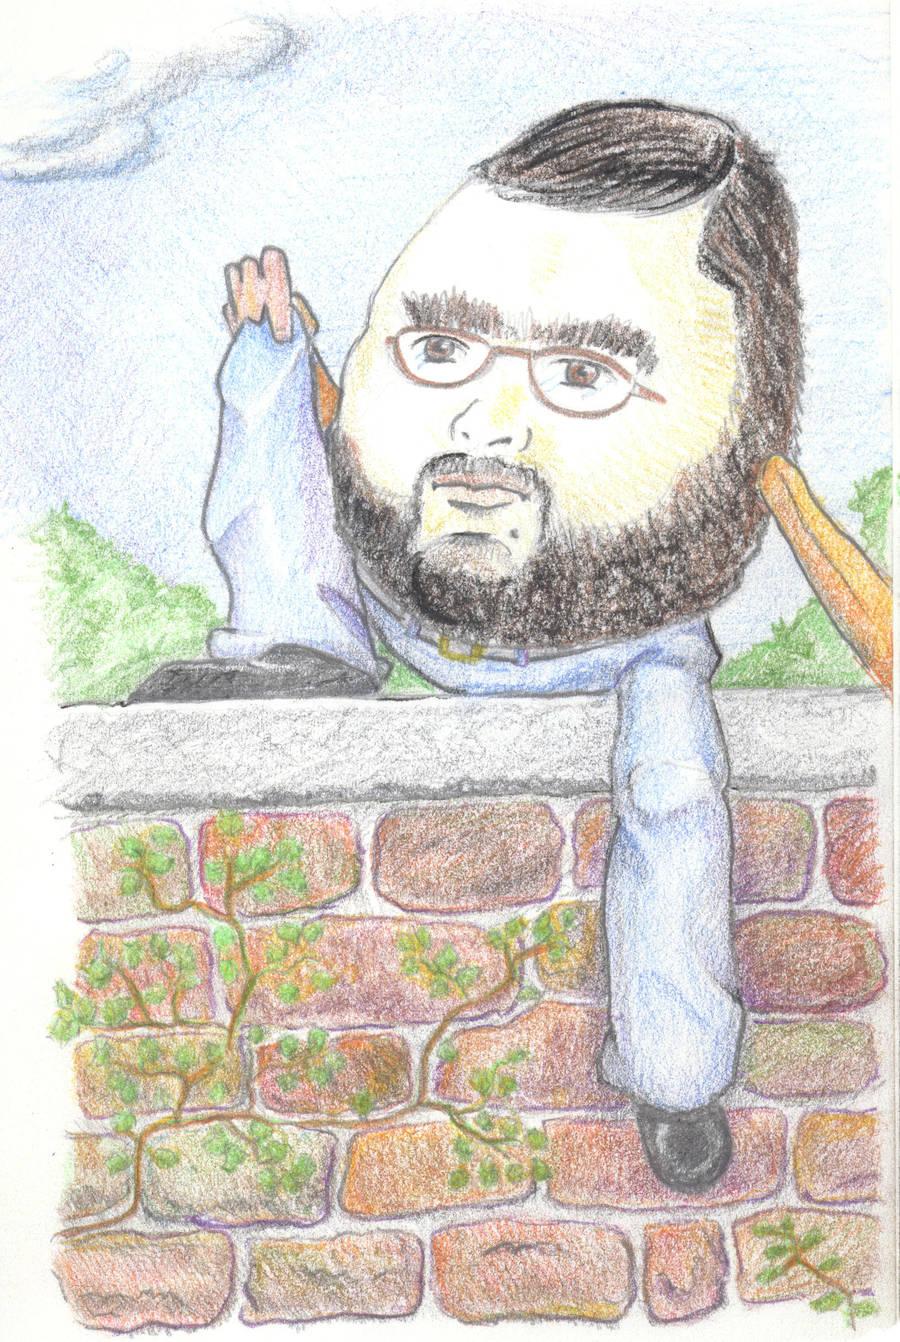 JJFGG's Profile Picture